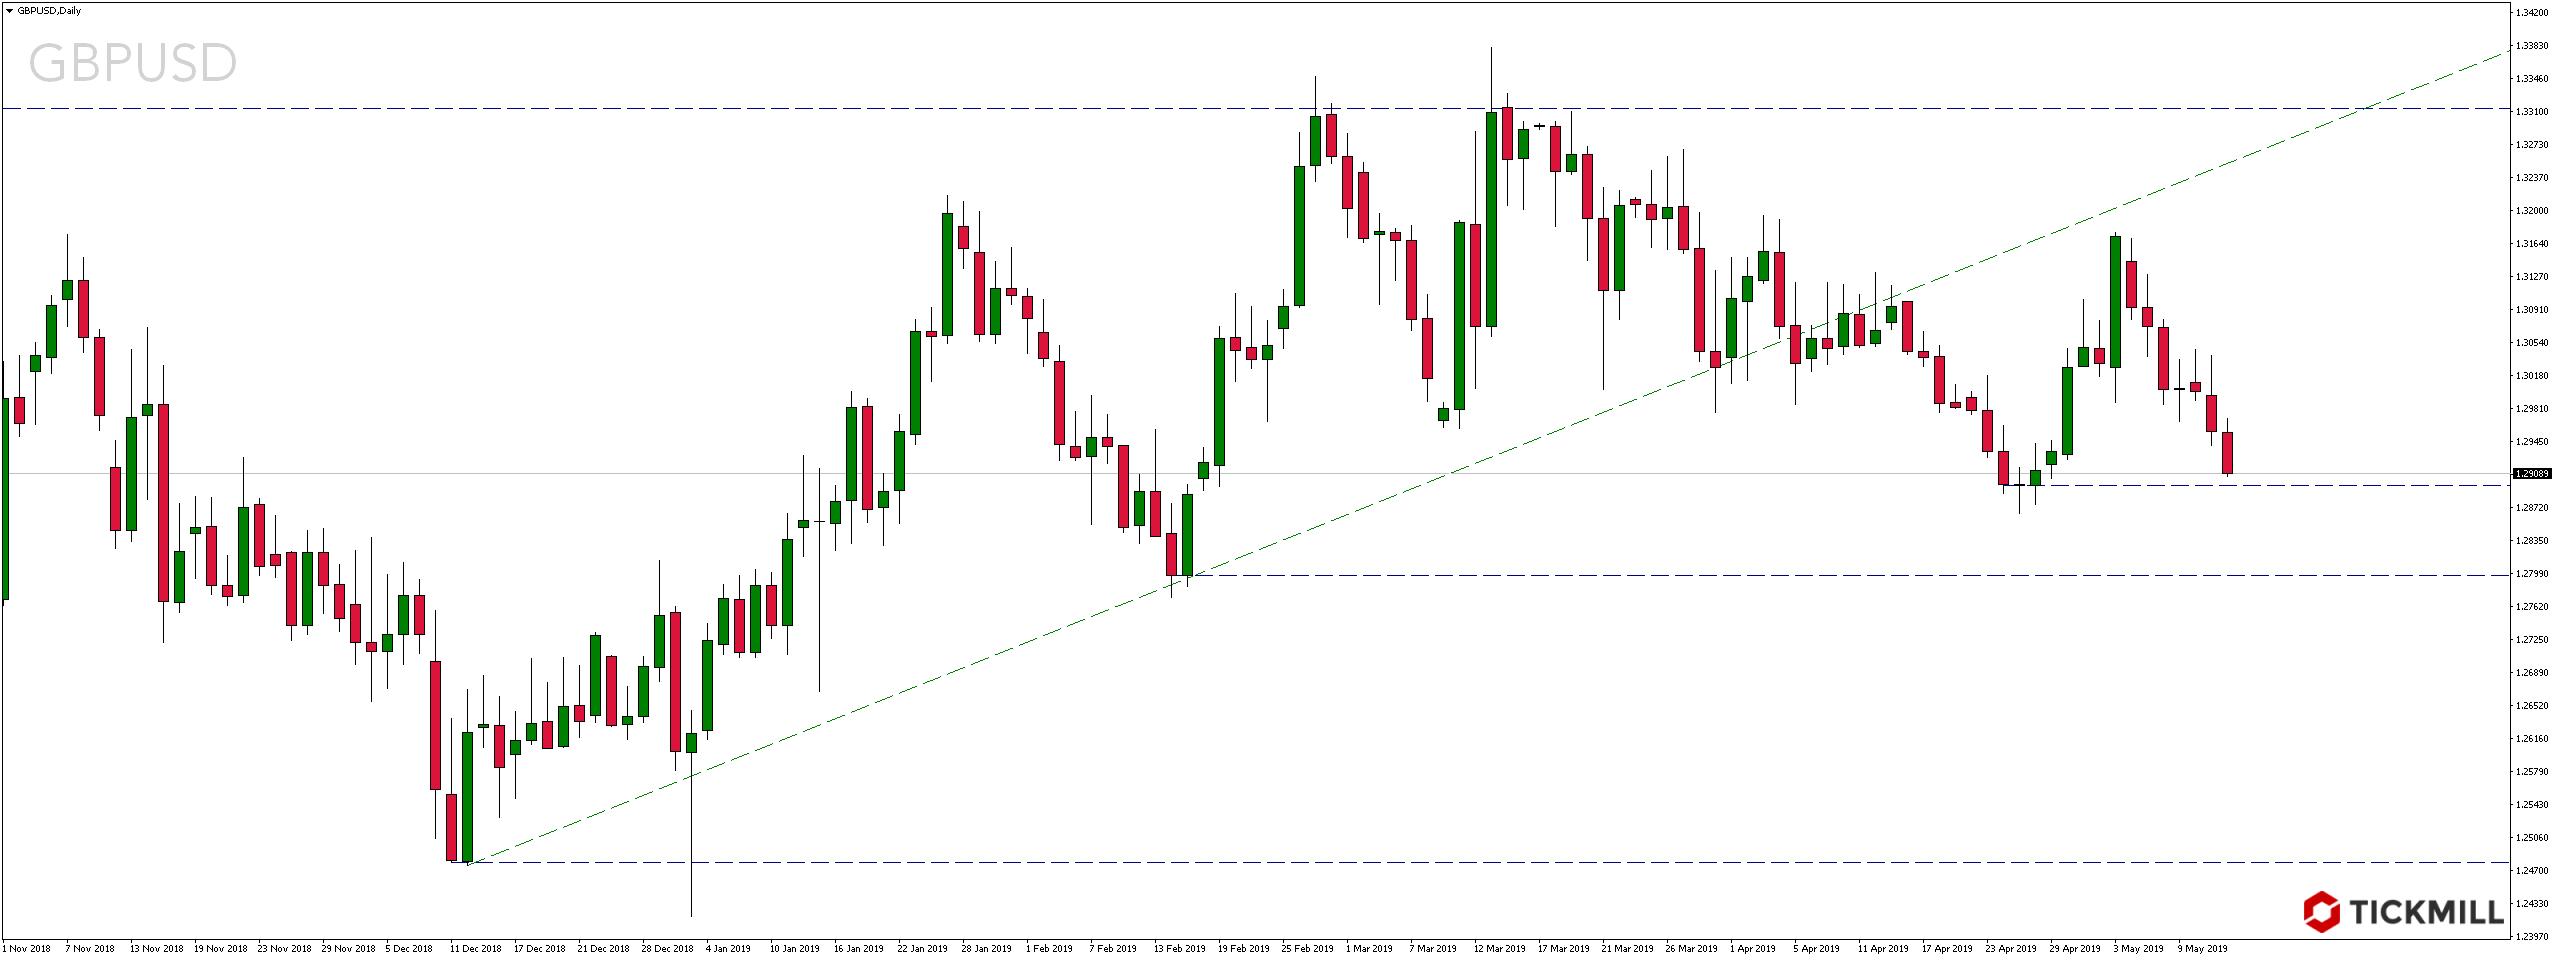 Kurs pary walutowej GBPUSD we wtorek, 14 maja 2019 roku